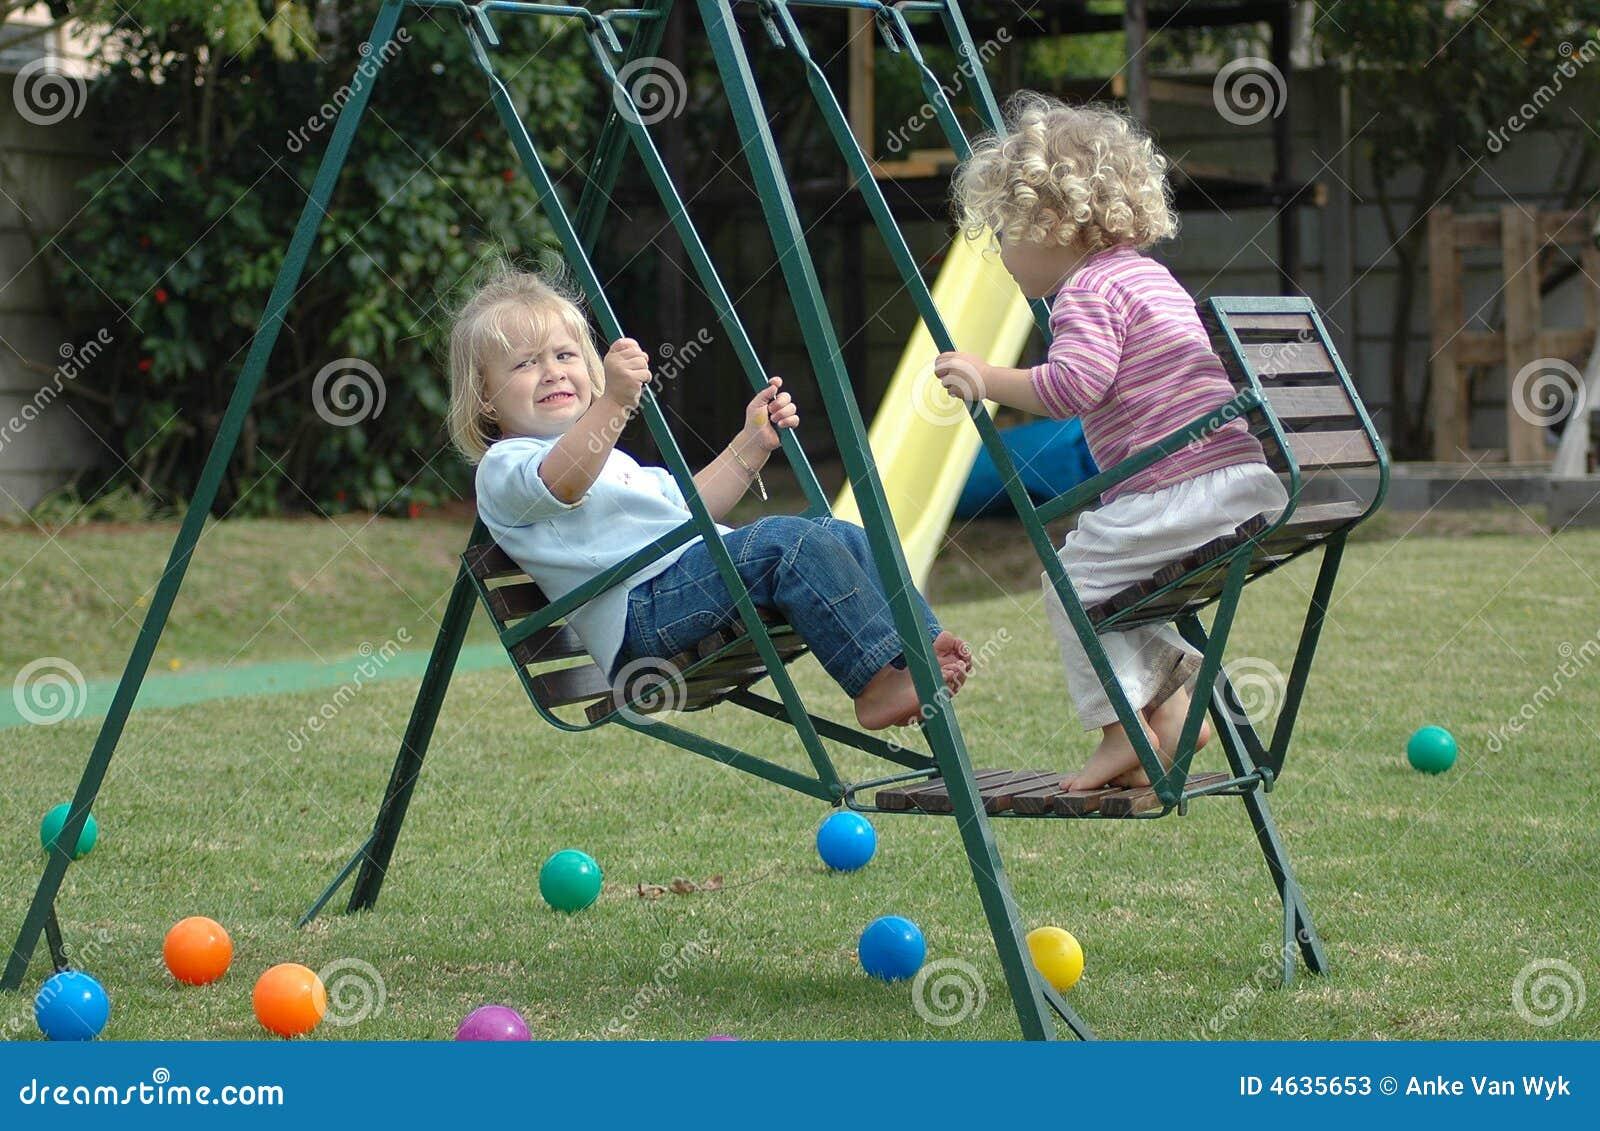 https://thumbs.dreamstime.com/z/kids-swing-4635653.jpg